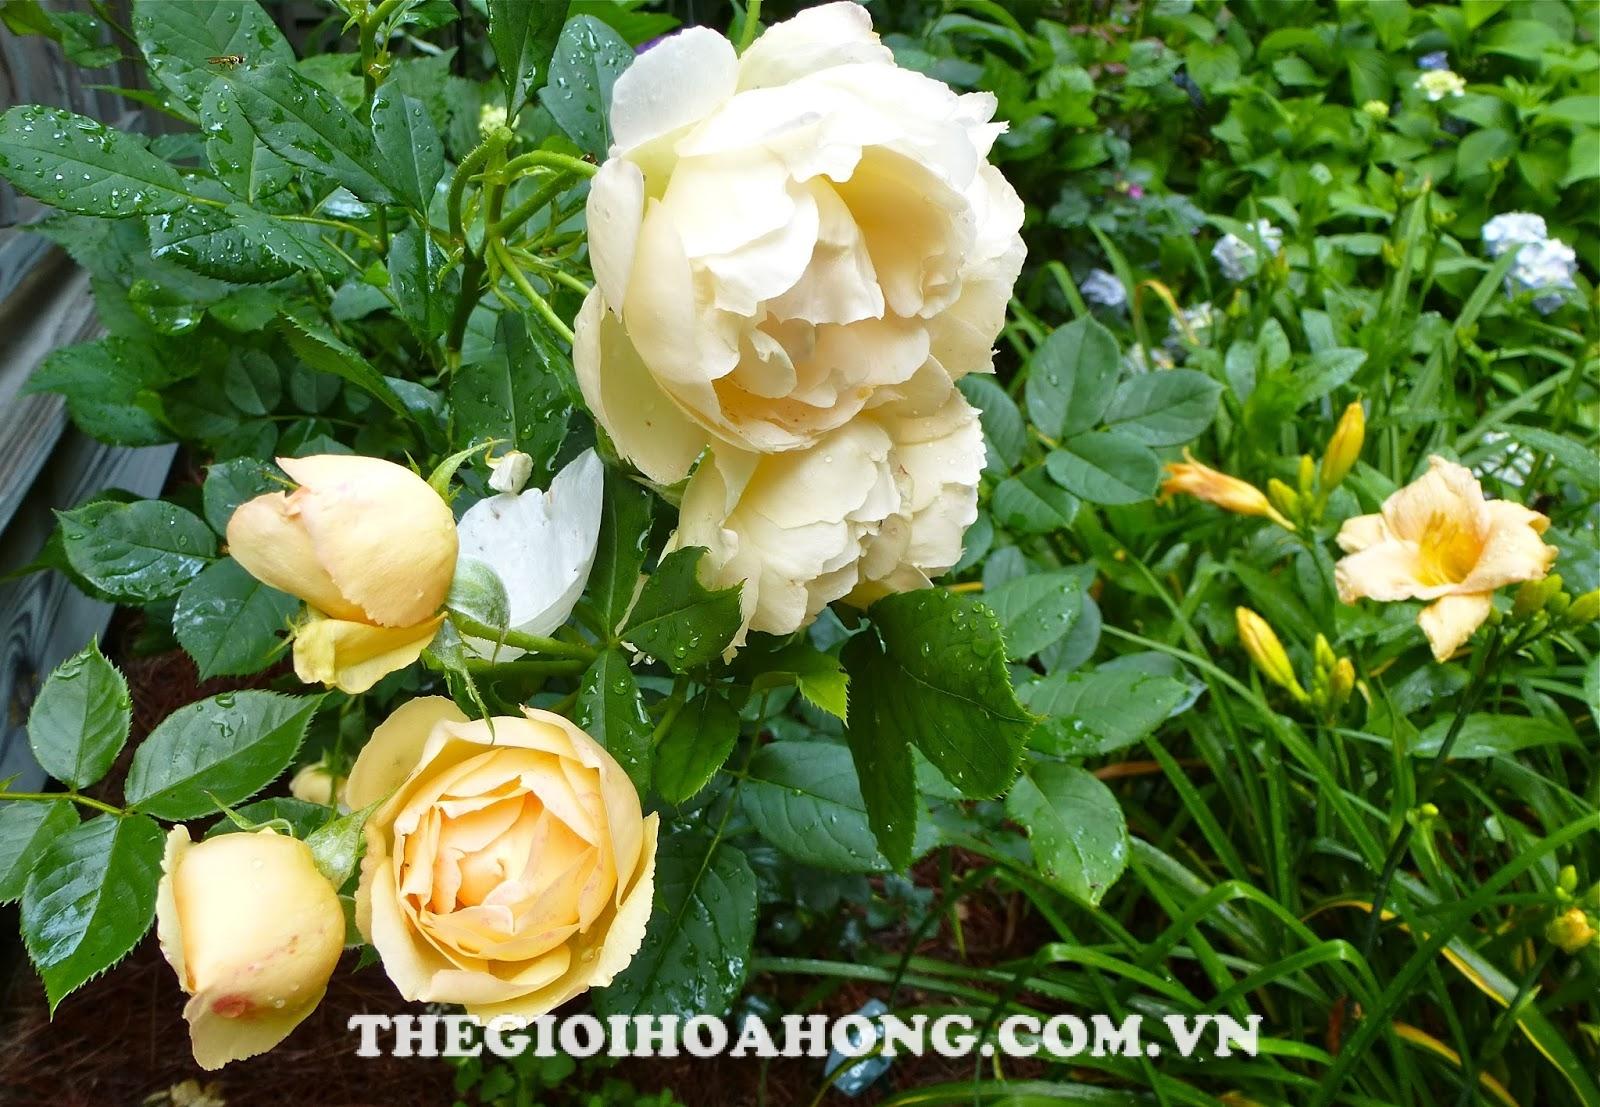 Màu sắc hoa hồng leo Wollerton Old Hall Rose rất đẹp